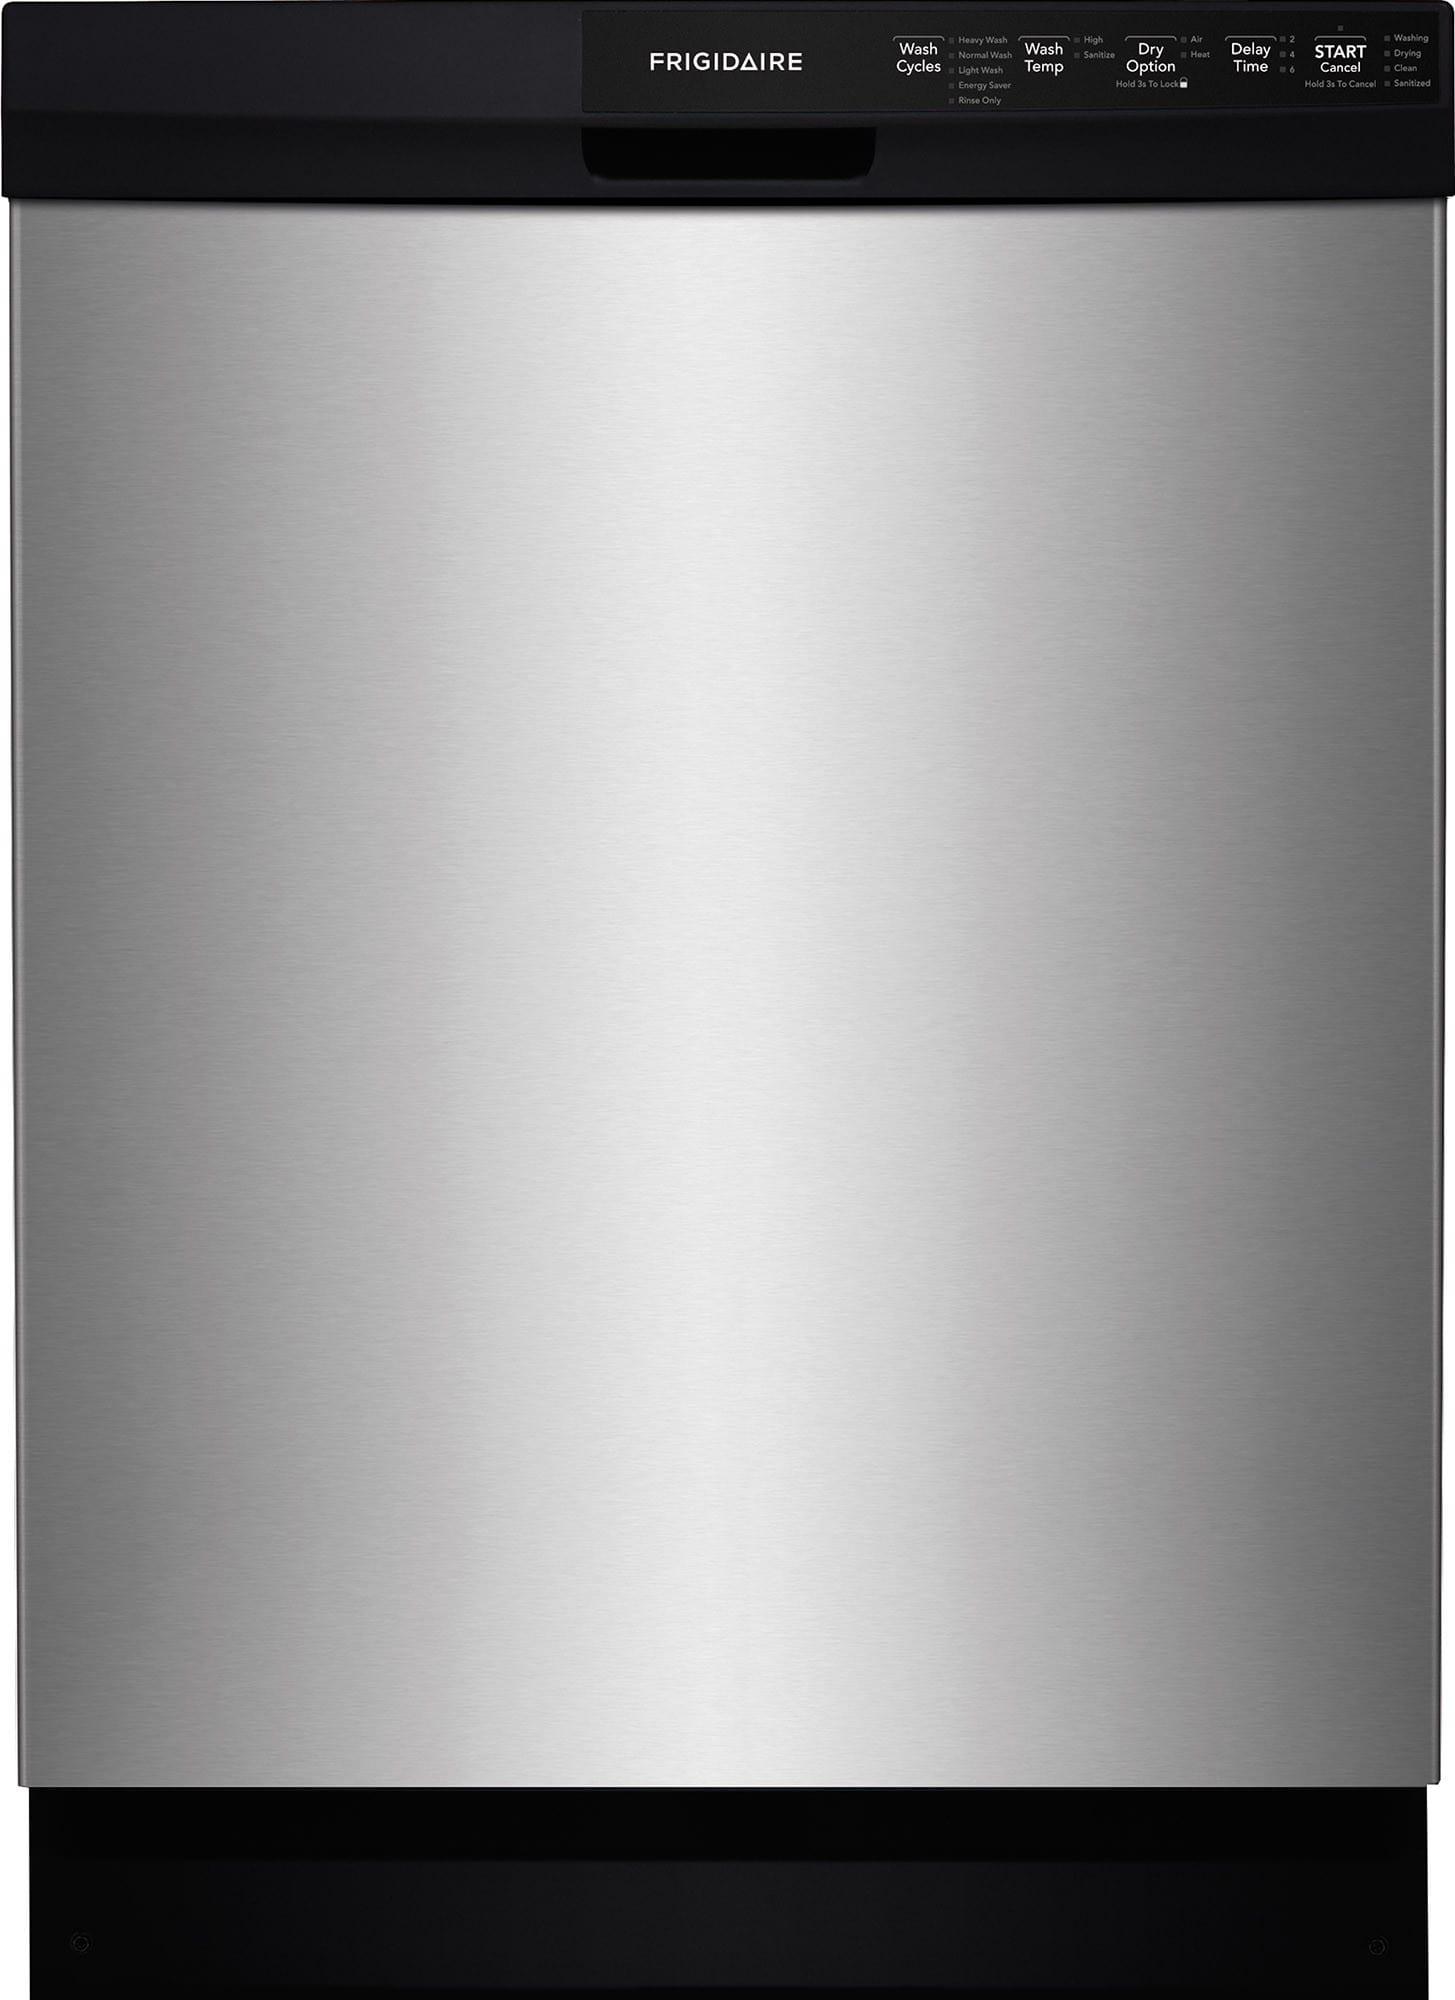 Frigidaire Ffbd2412ss Full Console Dishwasher With